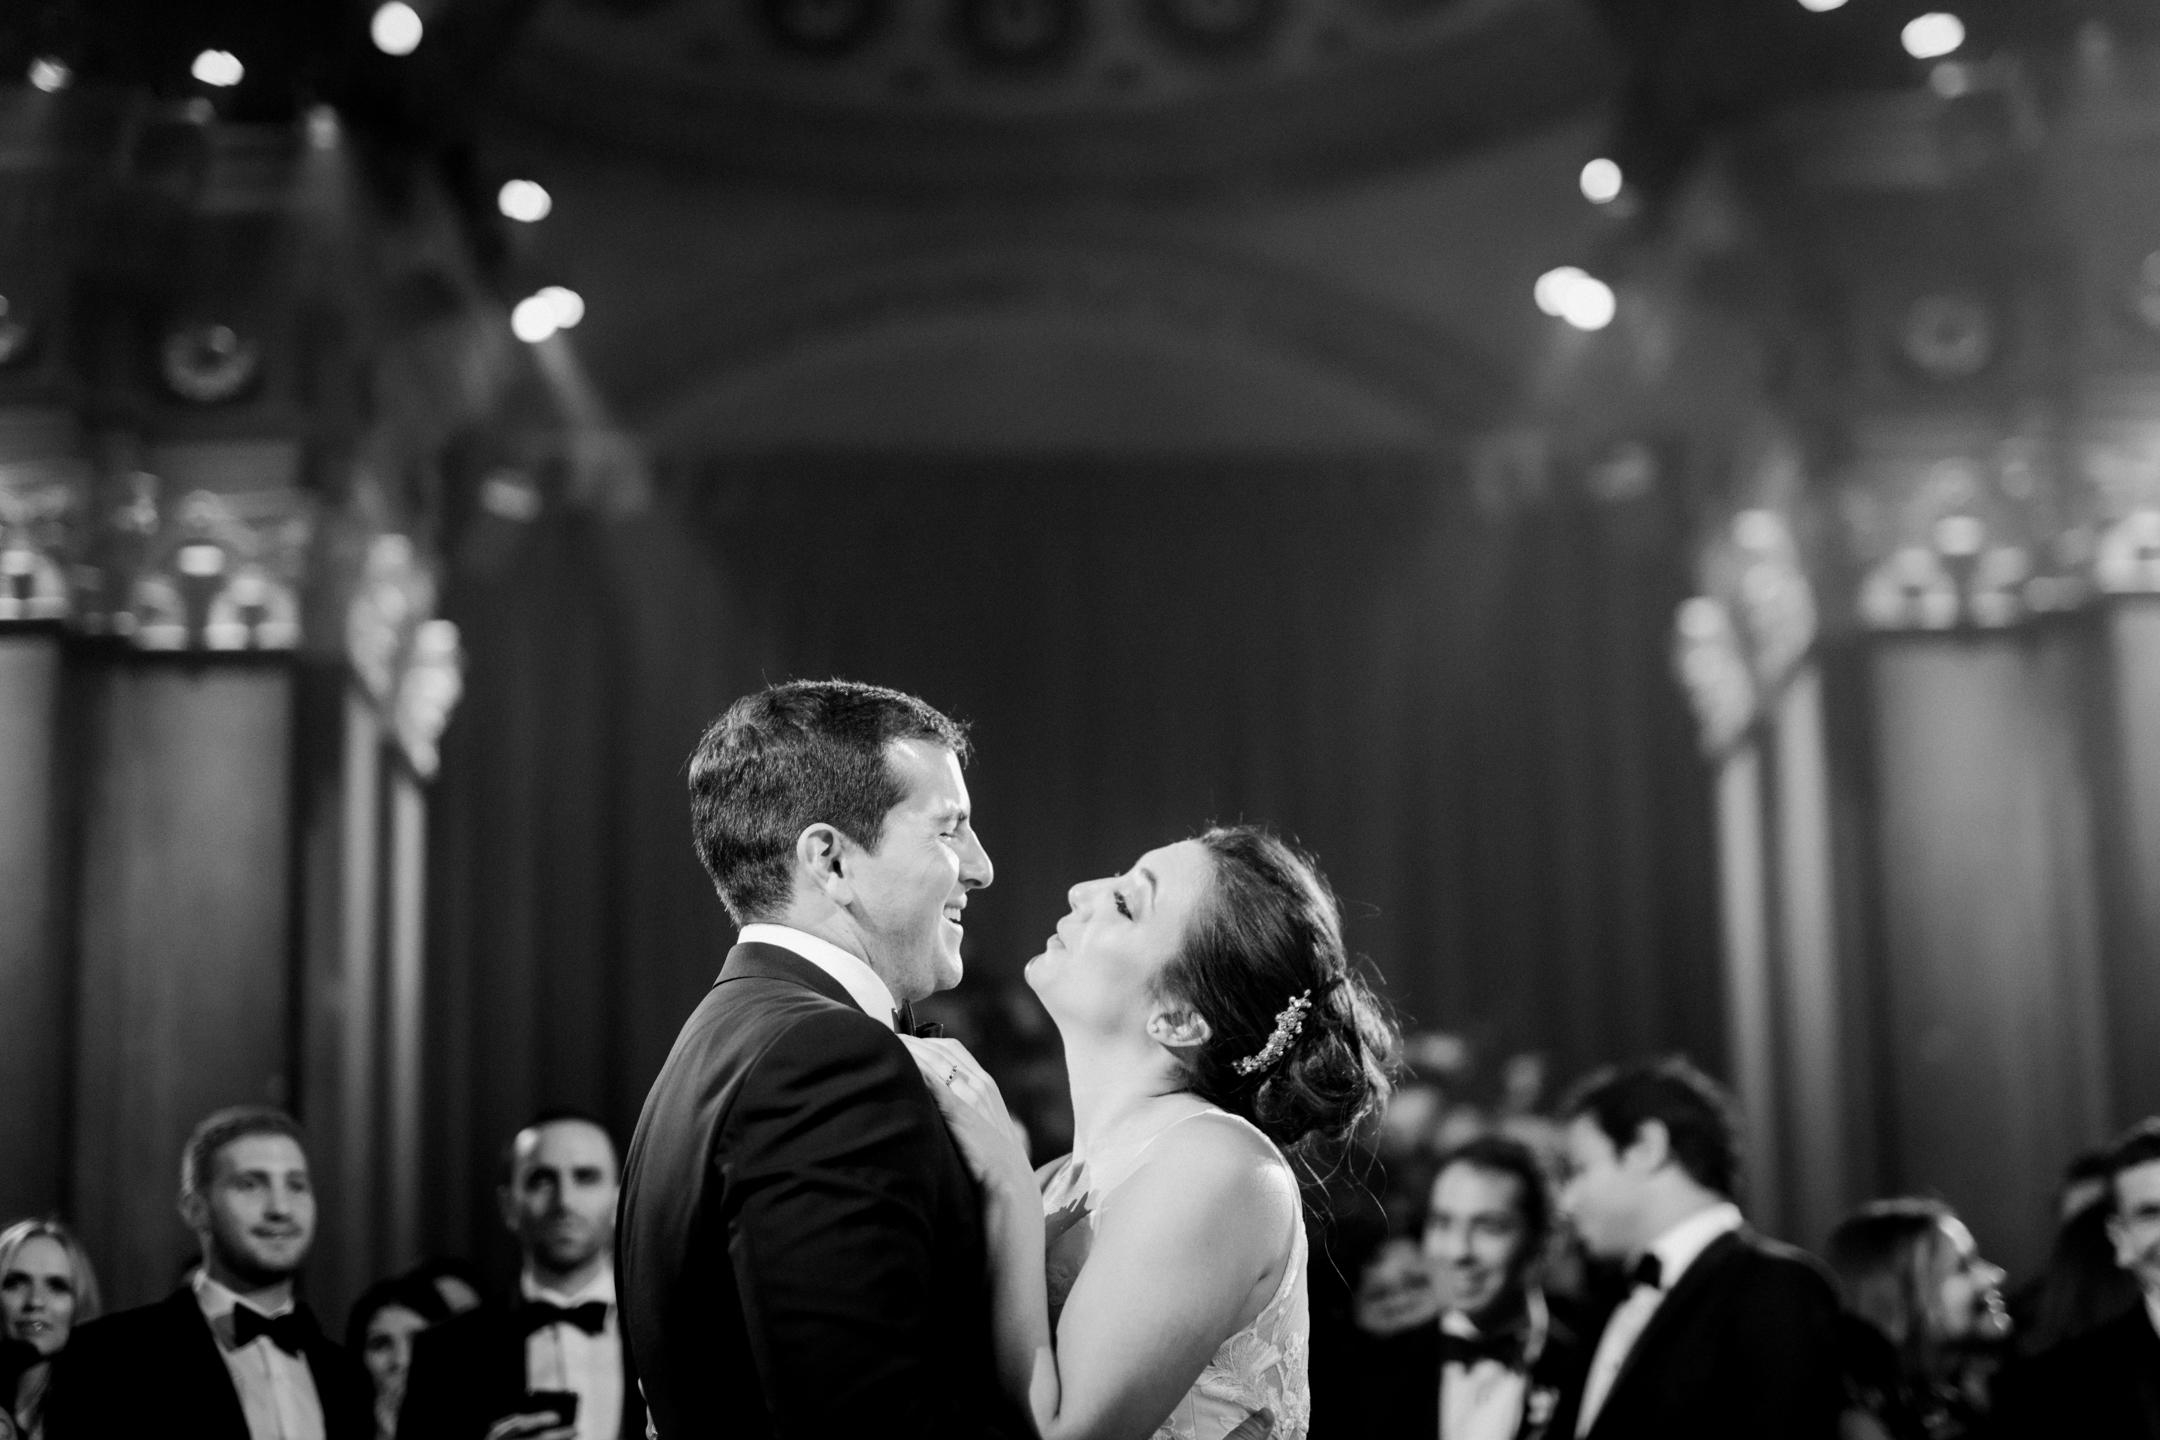 HANNA + BEN'S WEDDING TEASERS